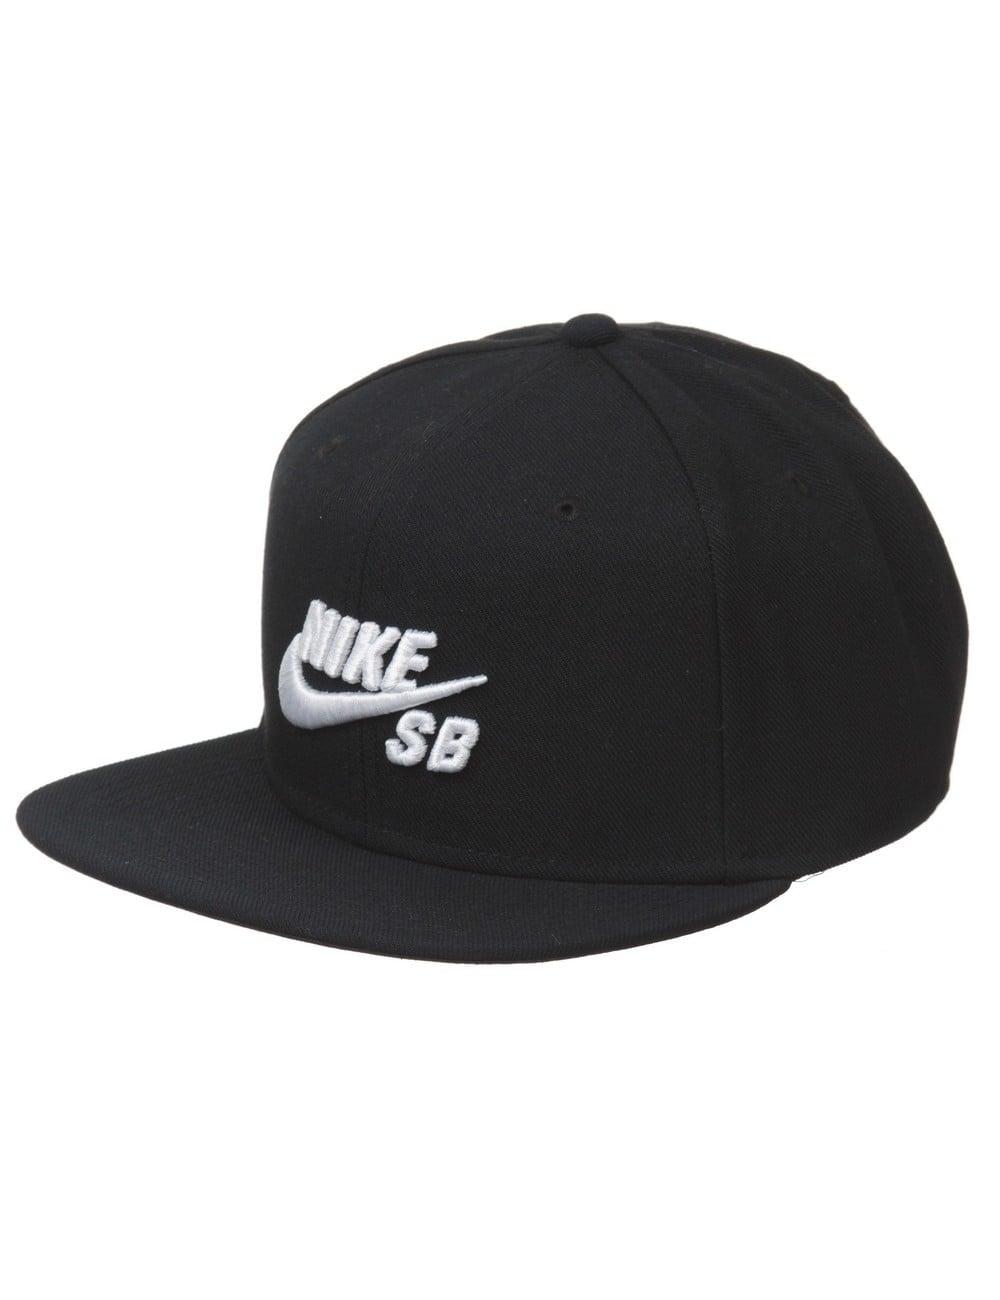 cb89d4c71 Icon Logo Pro Snapback Hat - Black